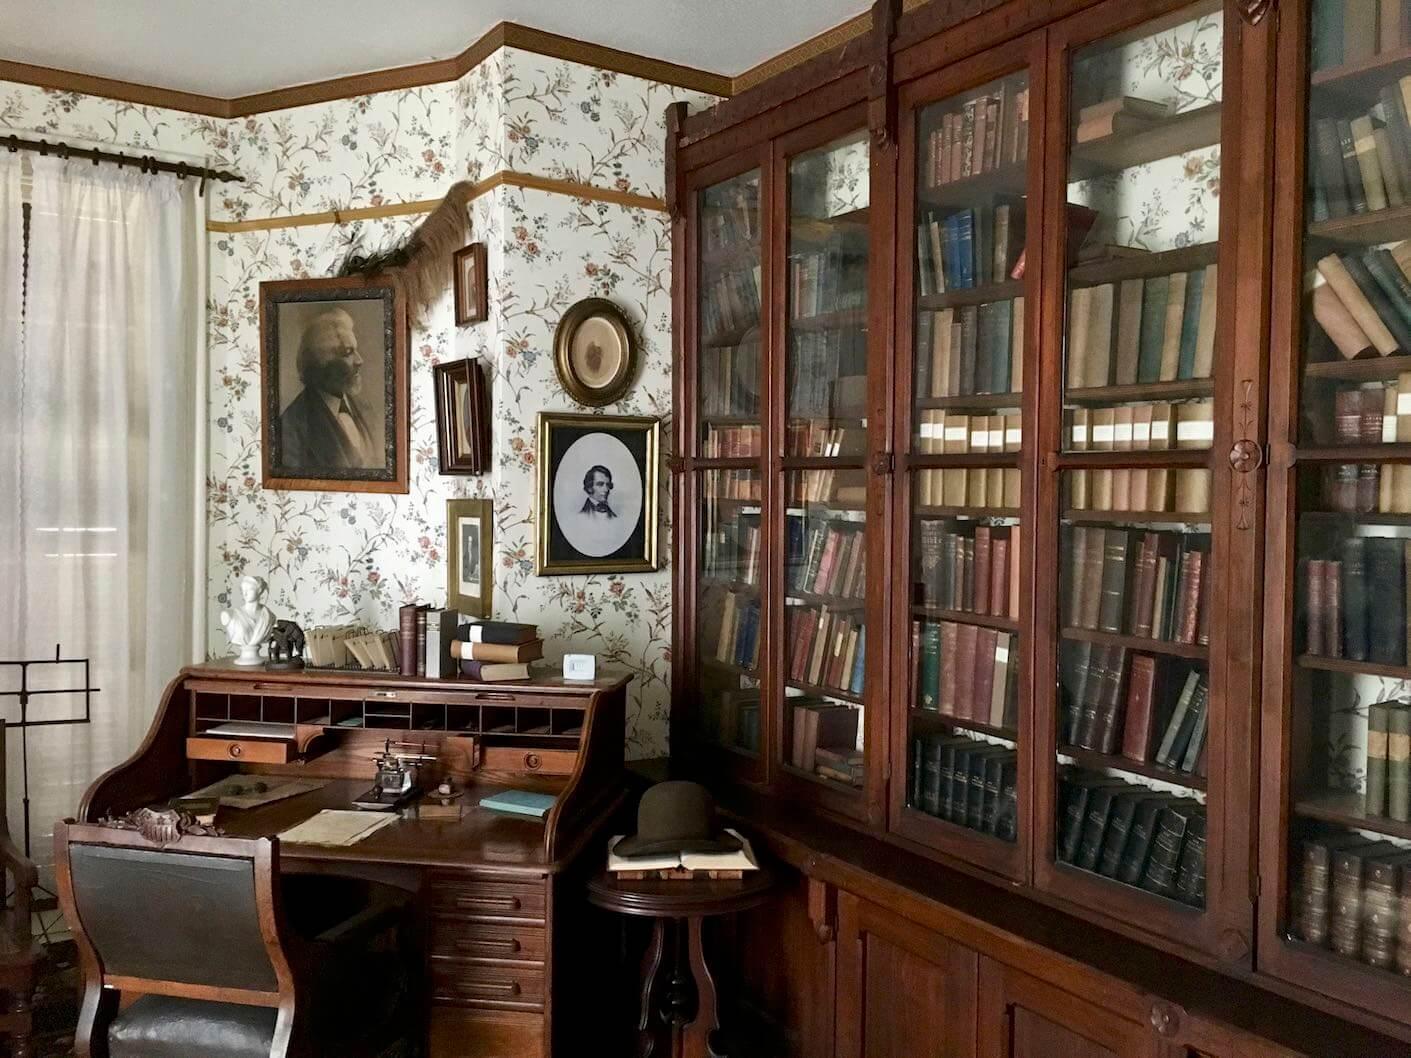 Frederick Douglass' desk and study, photo by Derek Wright.